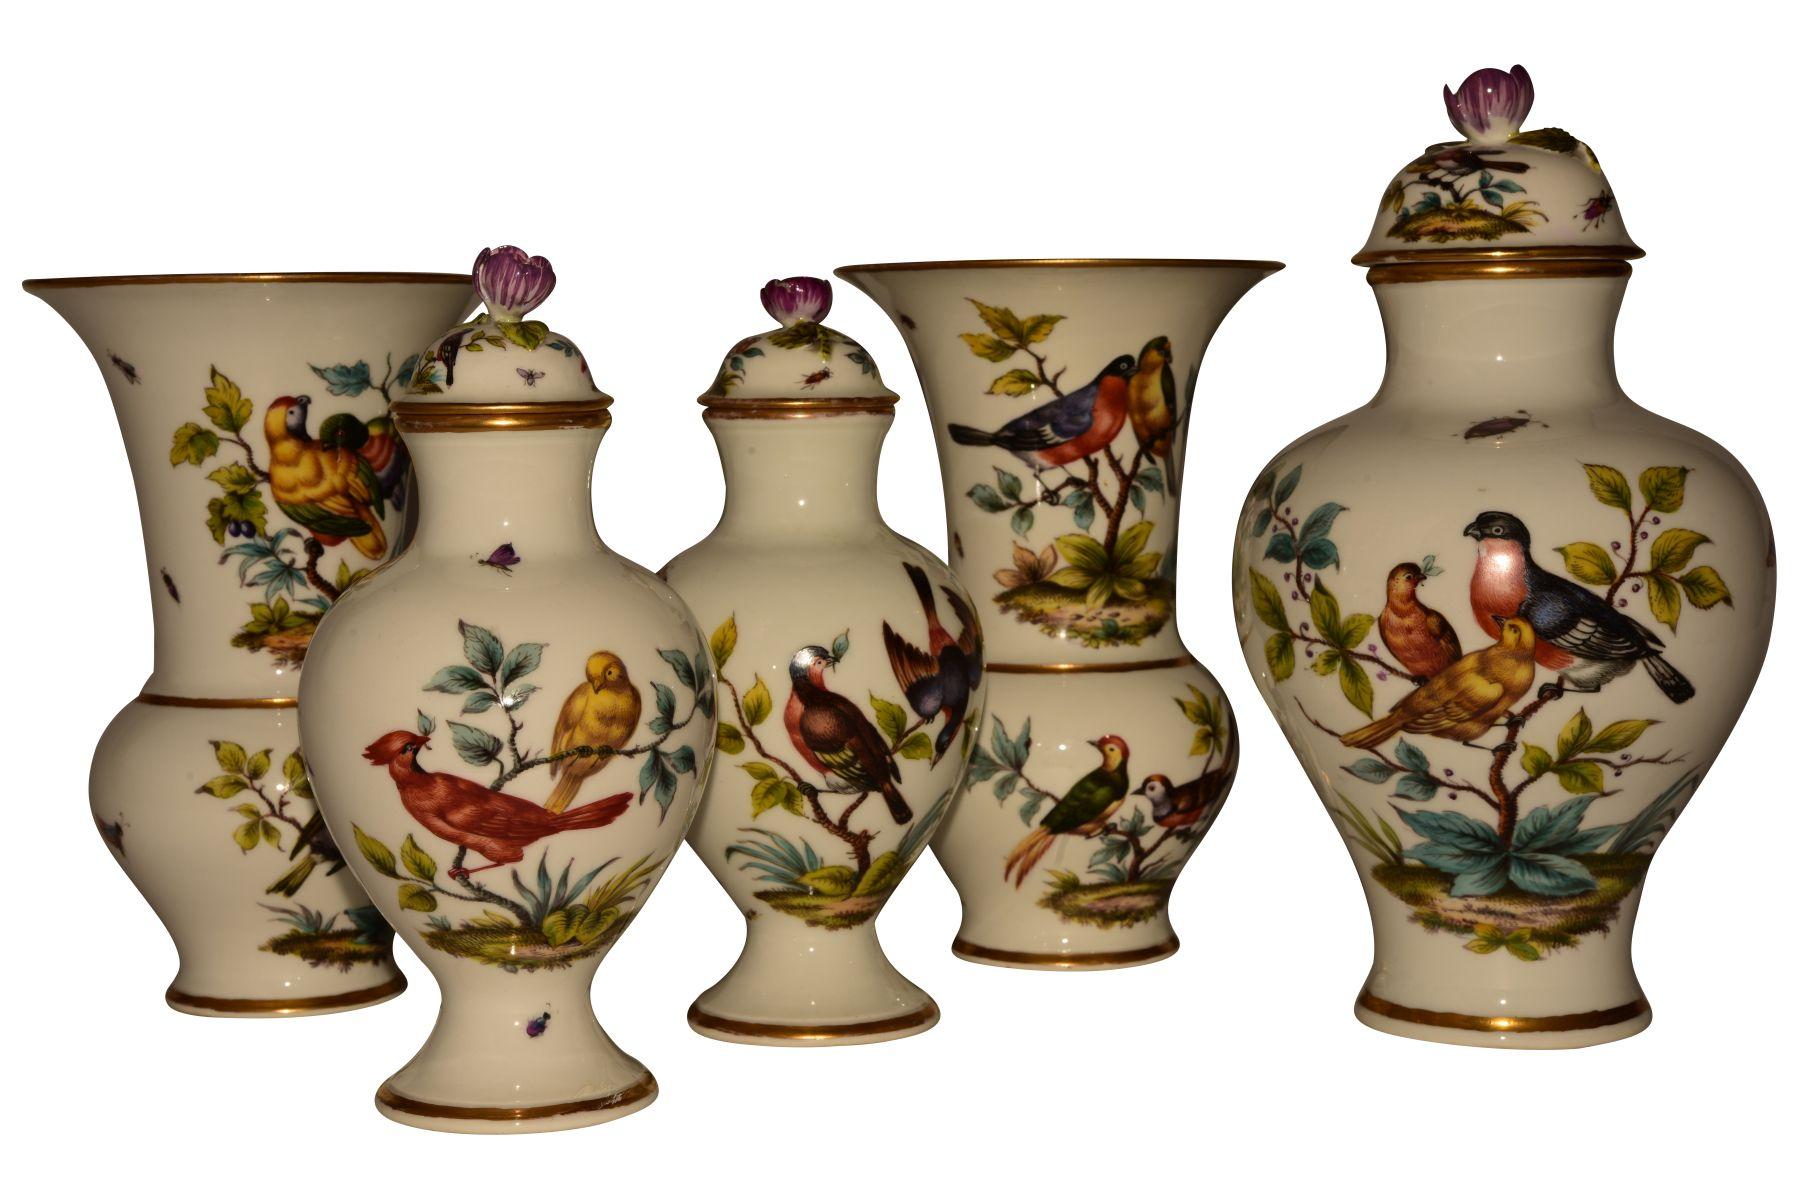 #52 5 rare Augustus Rex vases Dresden 19th century | 5 seltene Augustus Rex Vasen Meissen 19. Jahrhundert Image